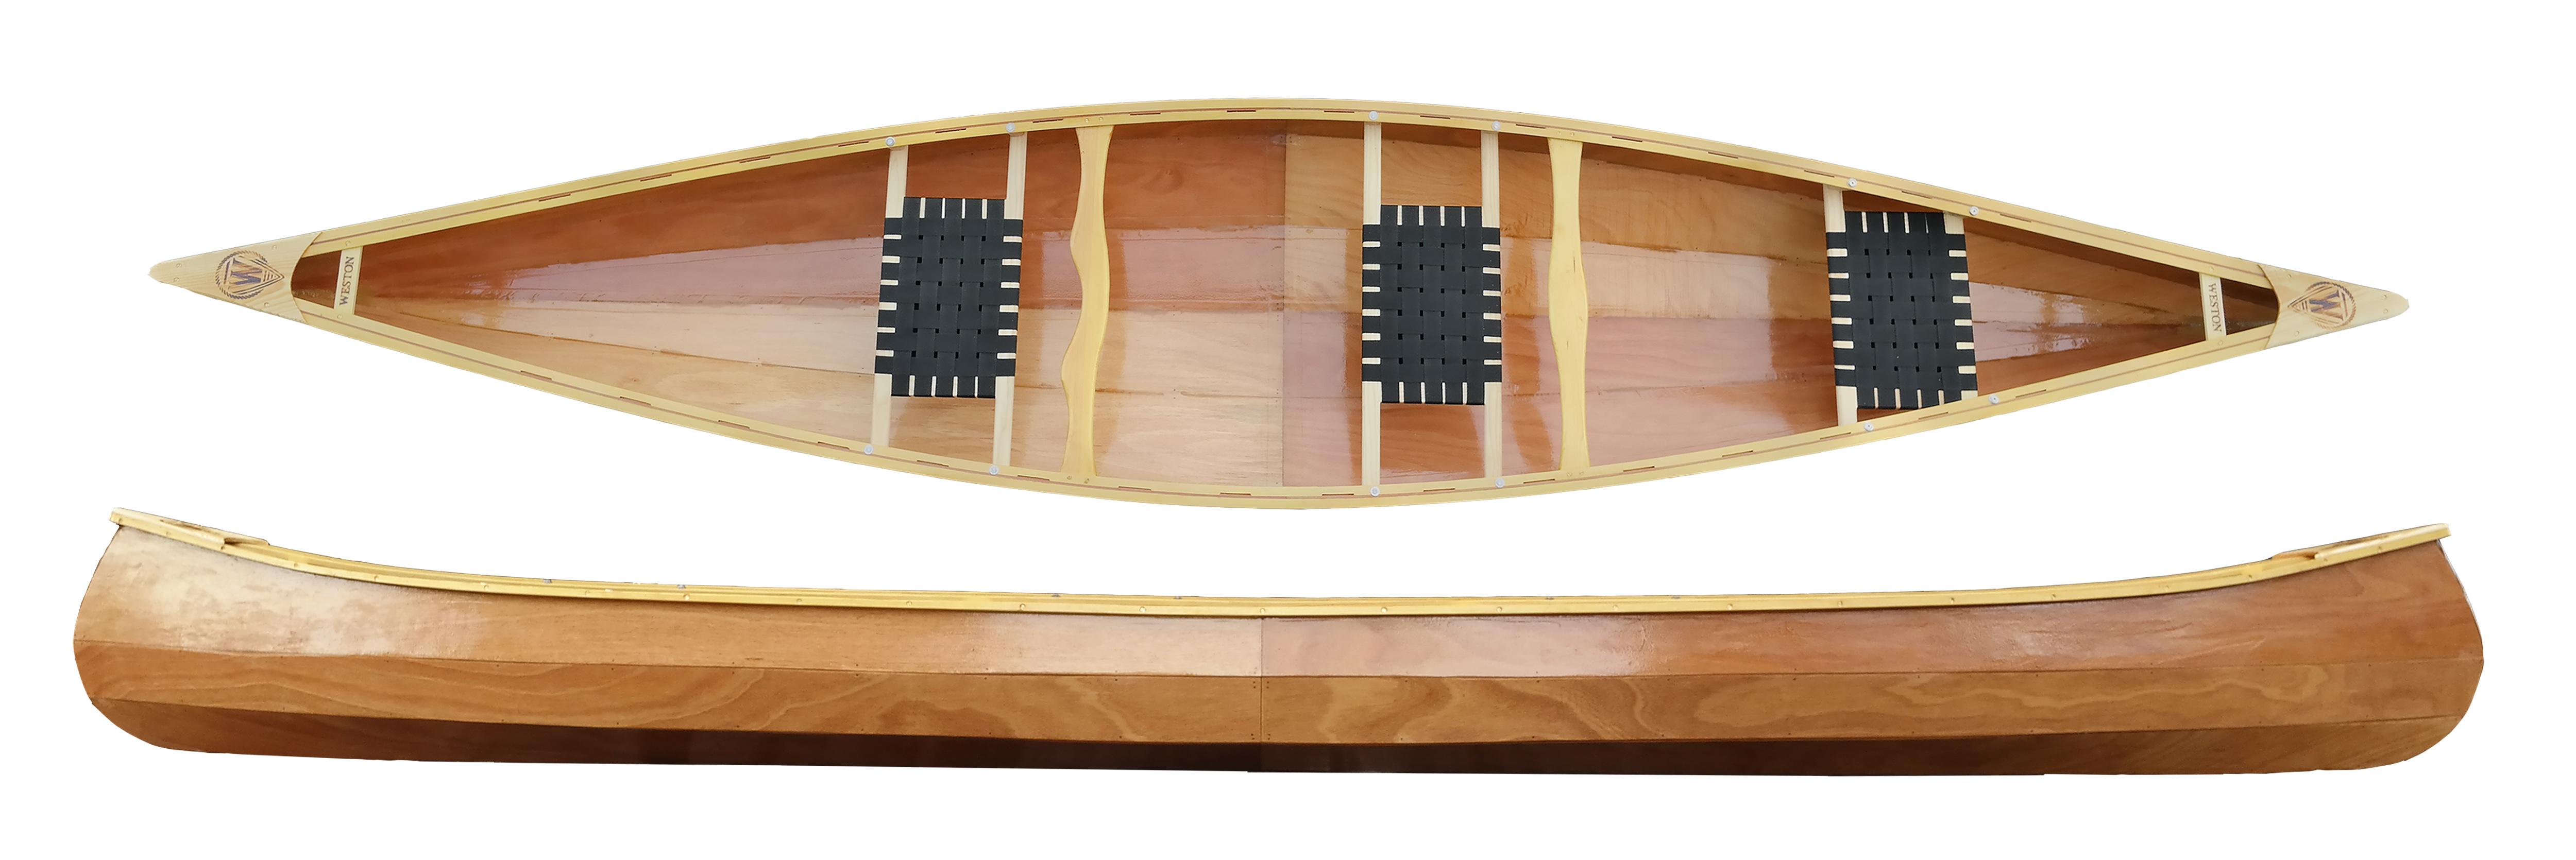 Handmade Wooden Canoe Weston 156